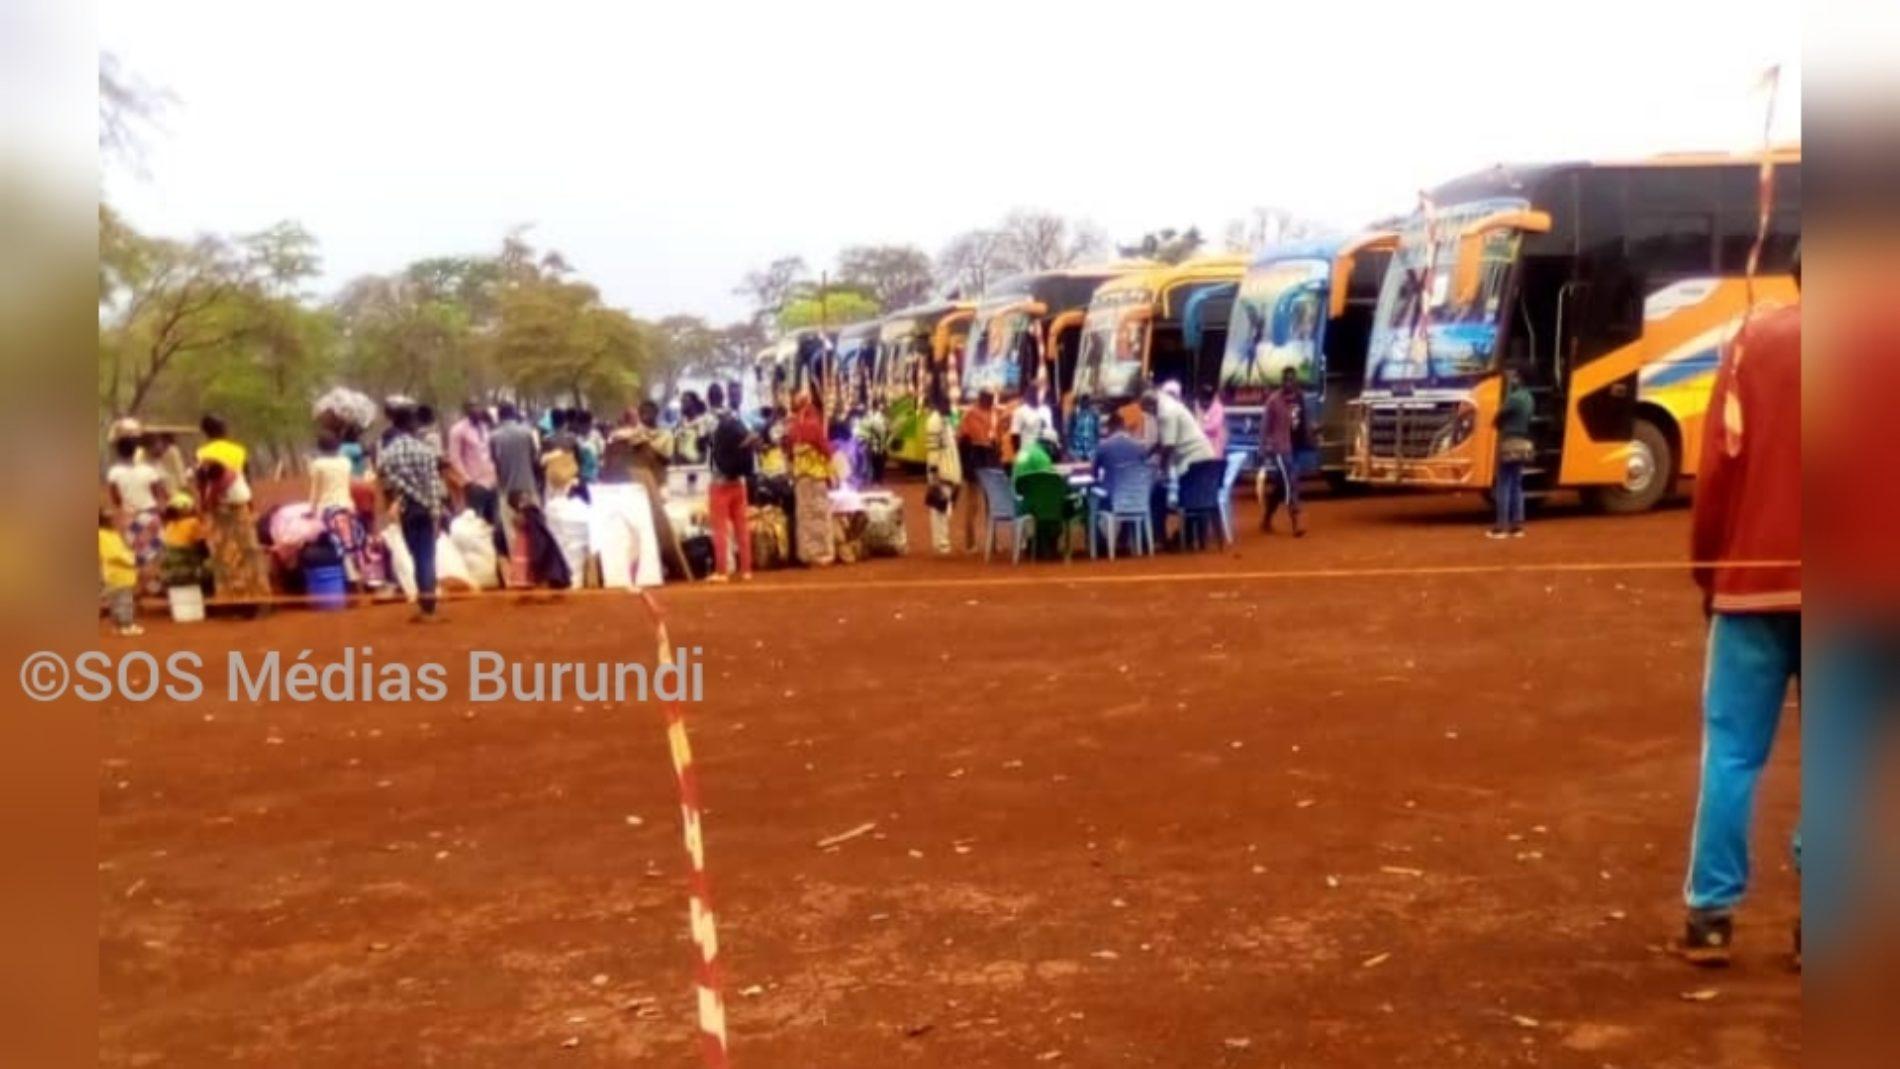 Mtendeli (Tanzanie) : reprise du transfert de réfugiés burundais vers Nduta